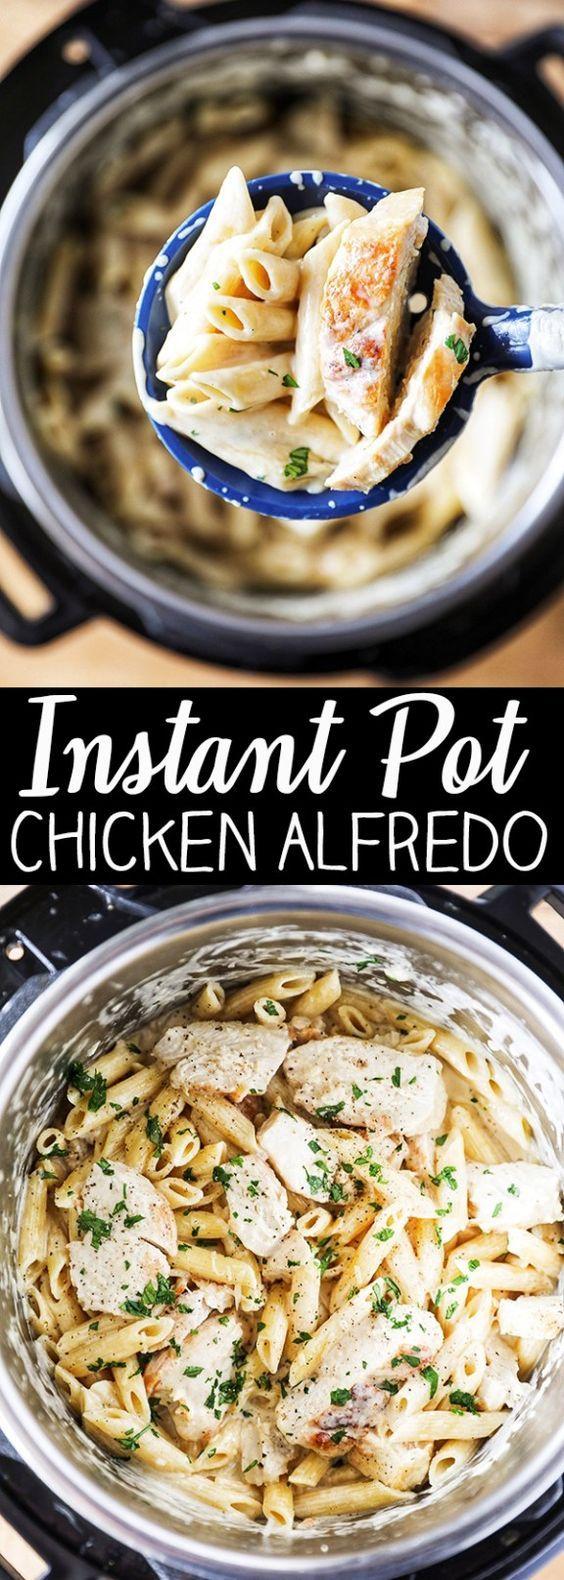 Instant Pot Chicken Alfredo Pasta images